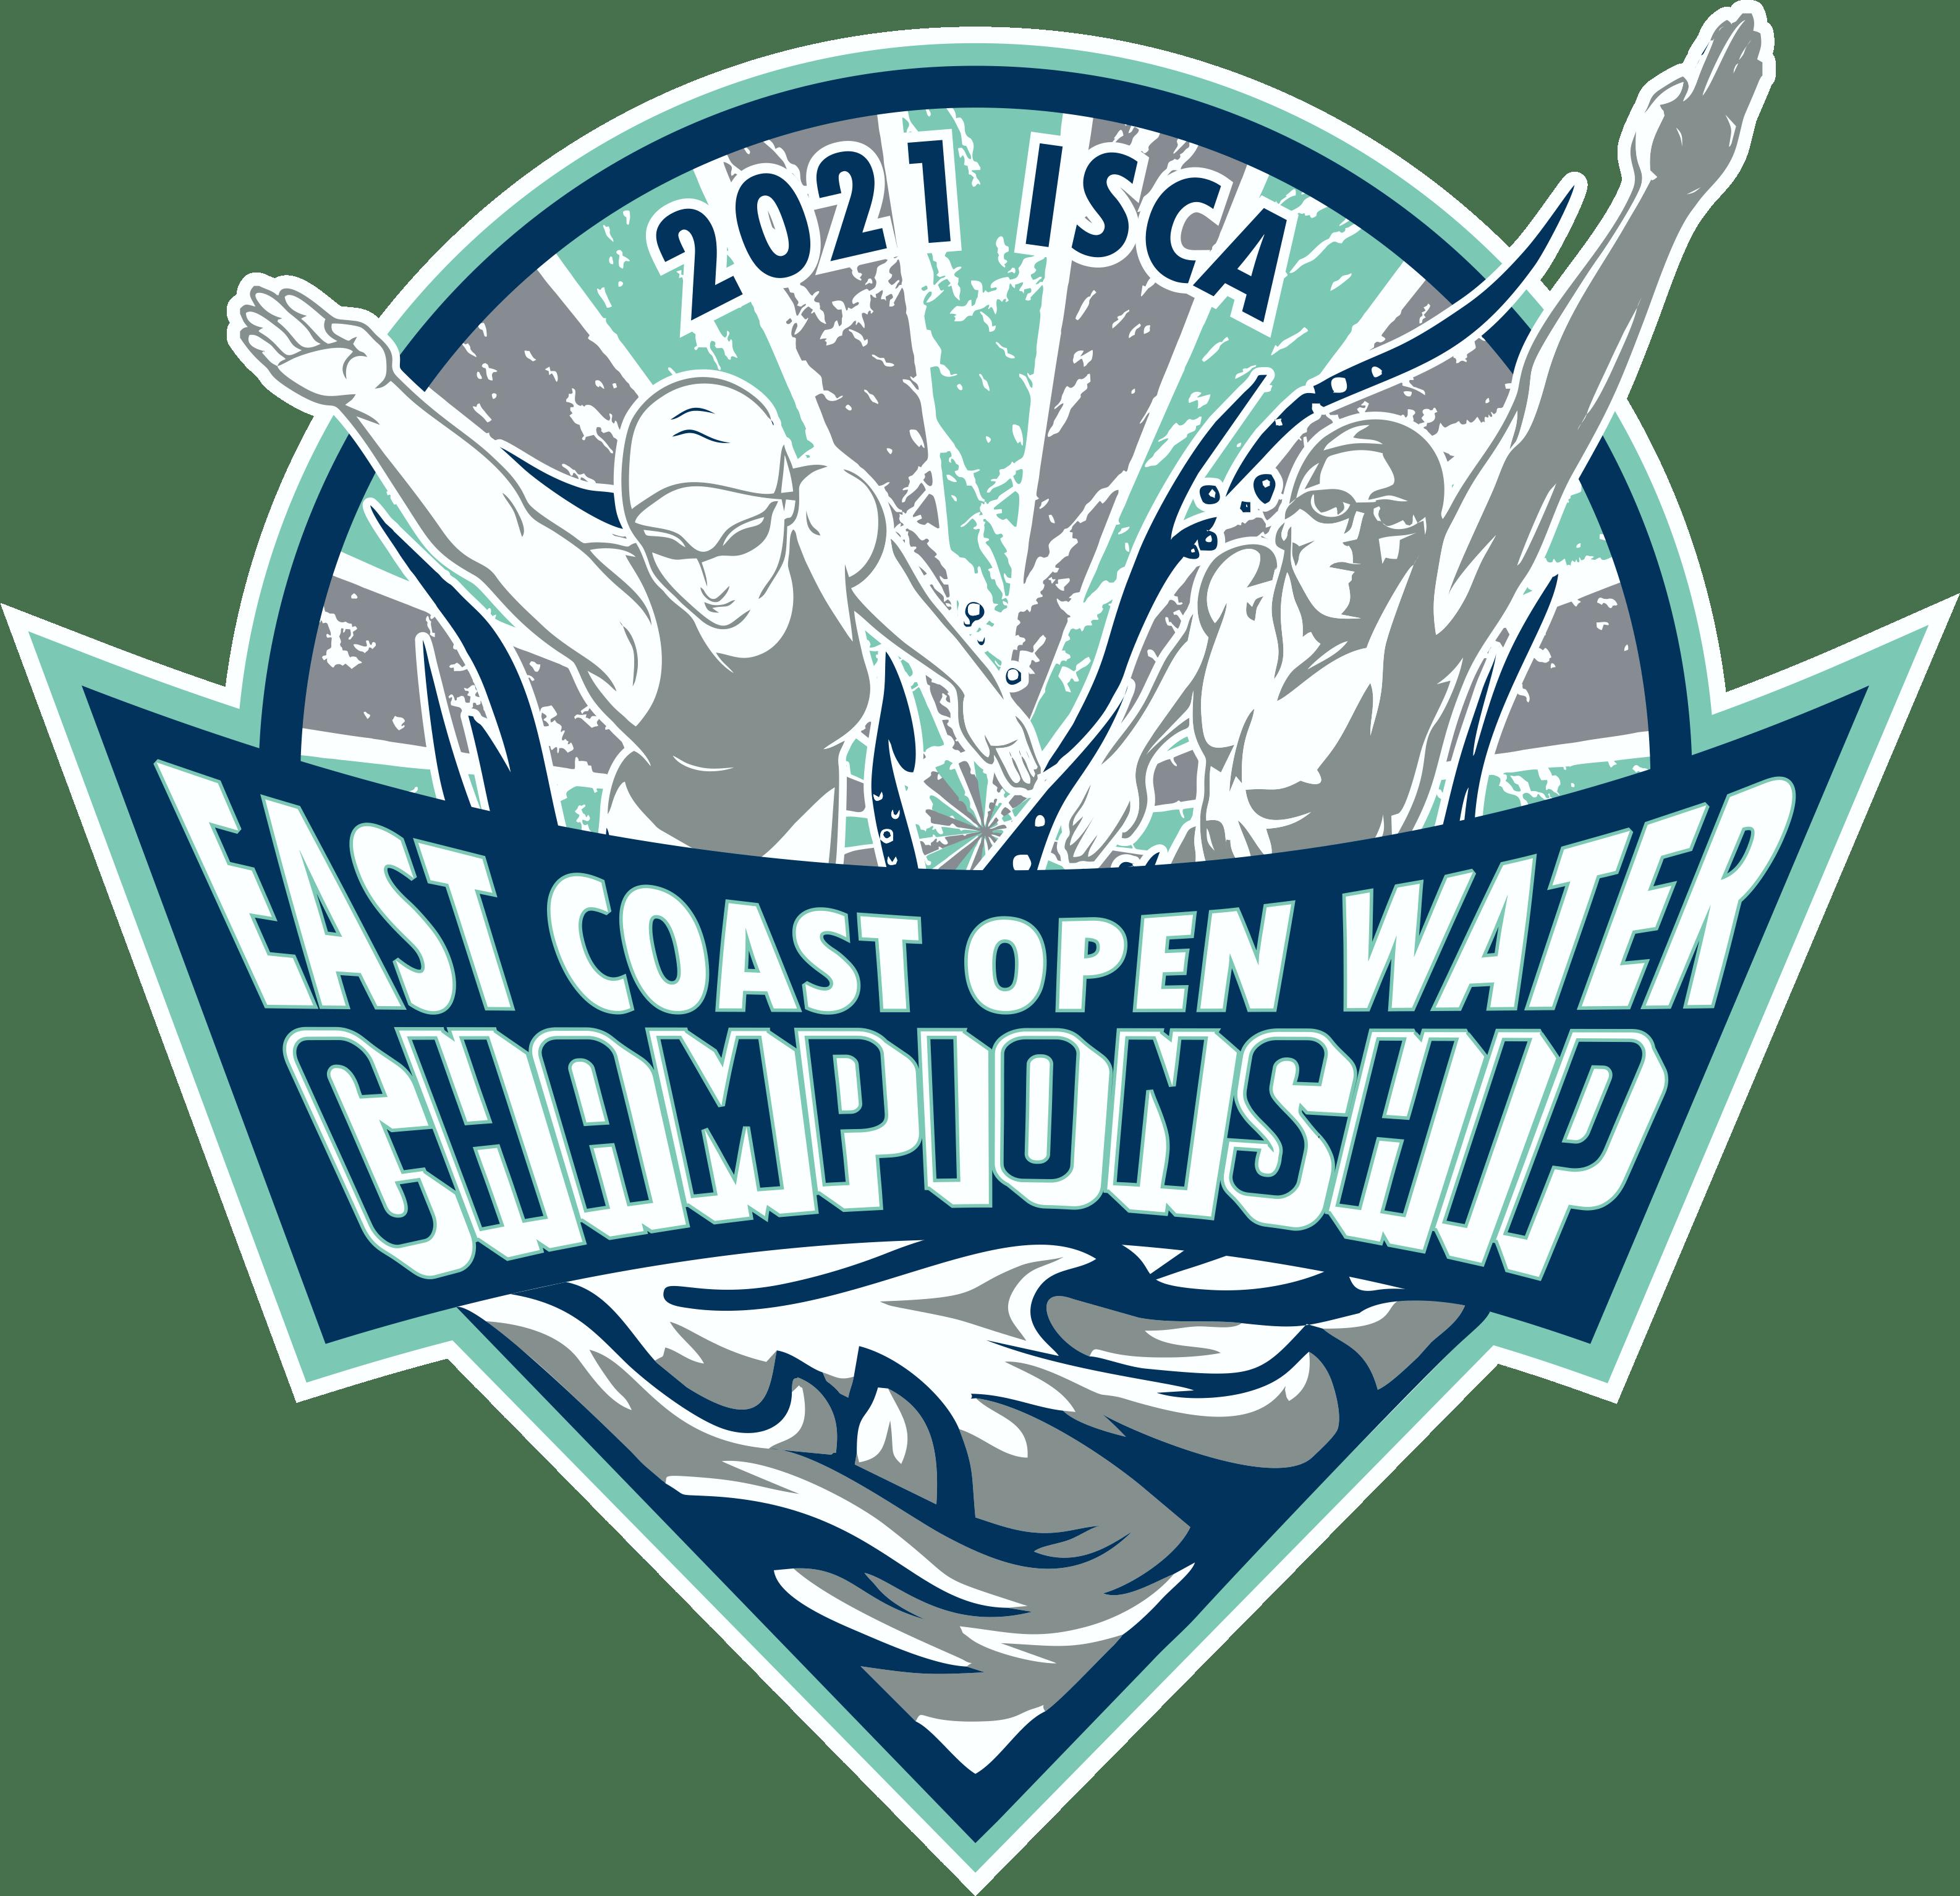 East Coast Open Water Championships logo